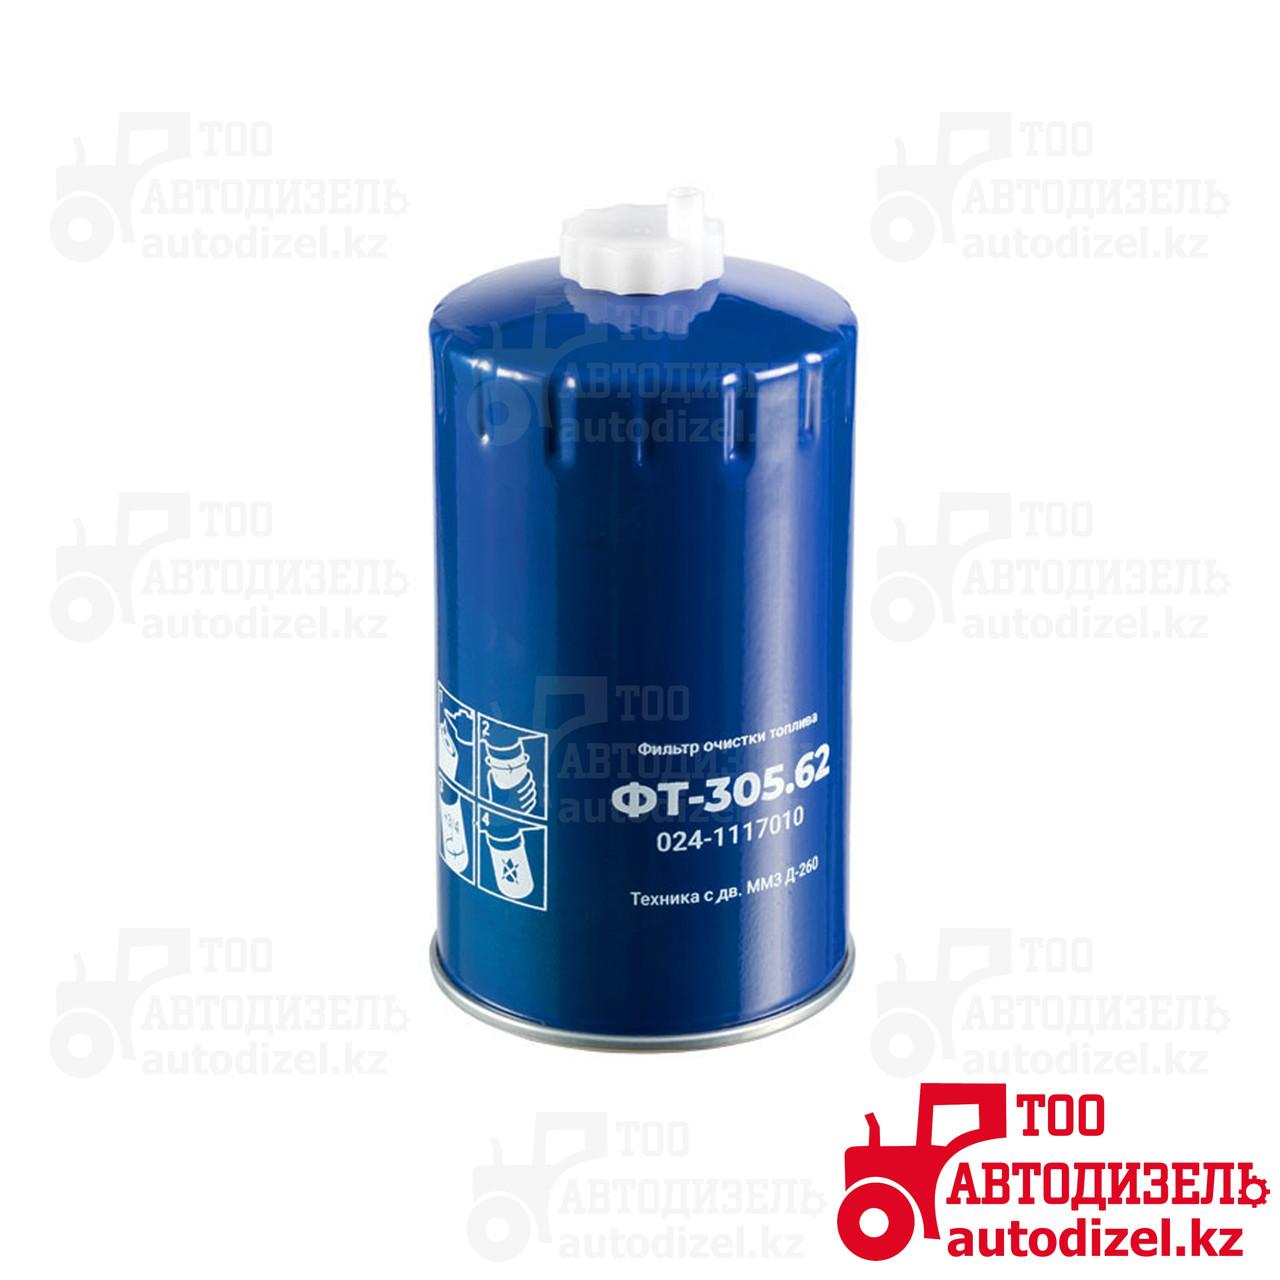 Фильтр топливный МТЗ ДВС 024-1117010 ММЗ Д-260 Кострома